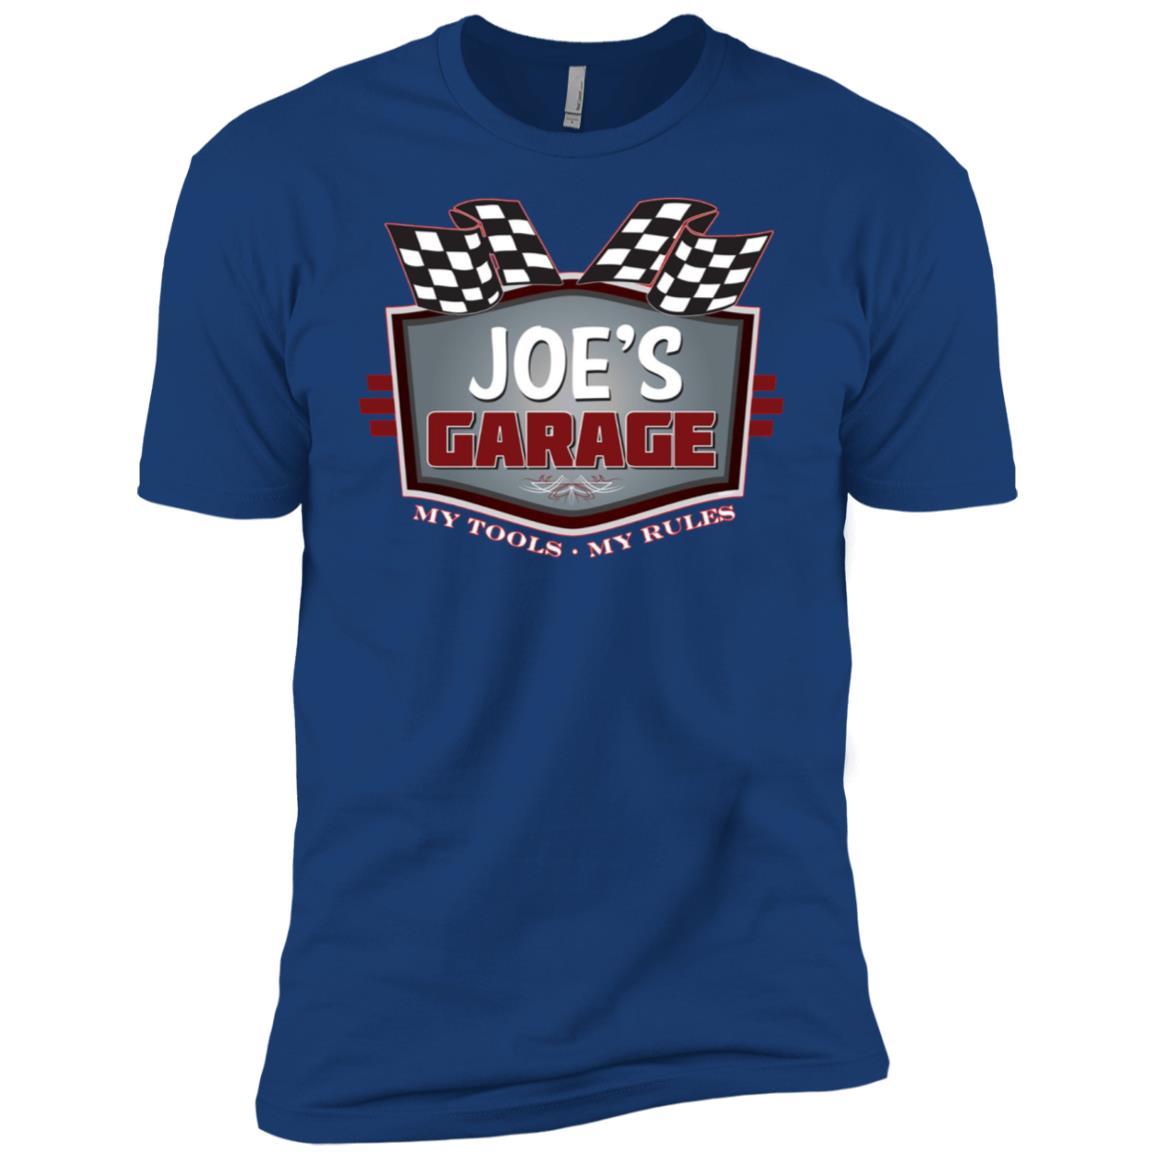 Joe's Garage Funny Car Guy – My Tools My Rules Men Short Sleeve T-Shirt